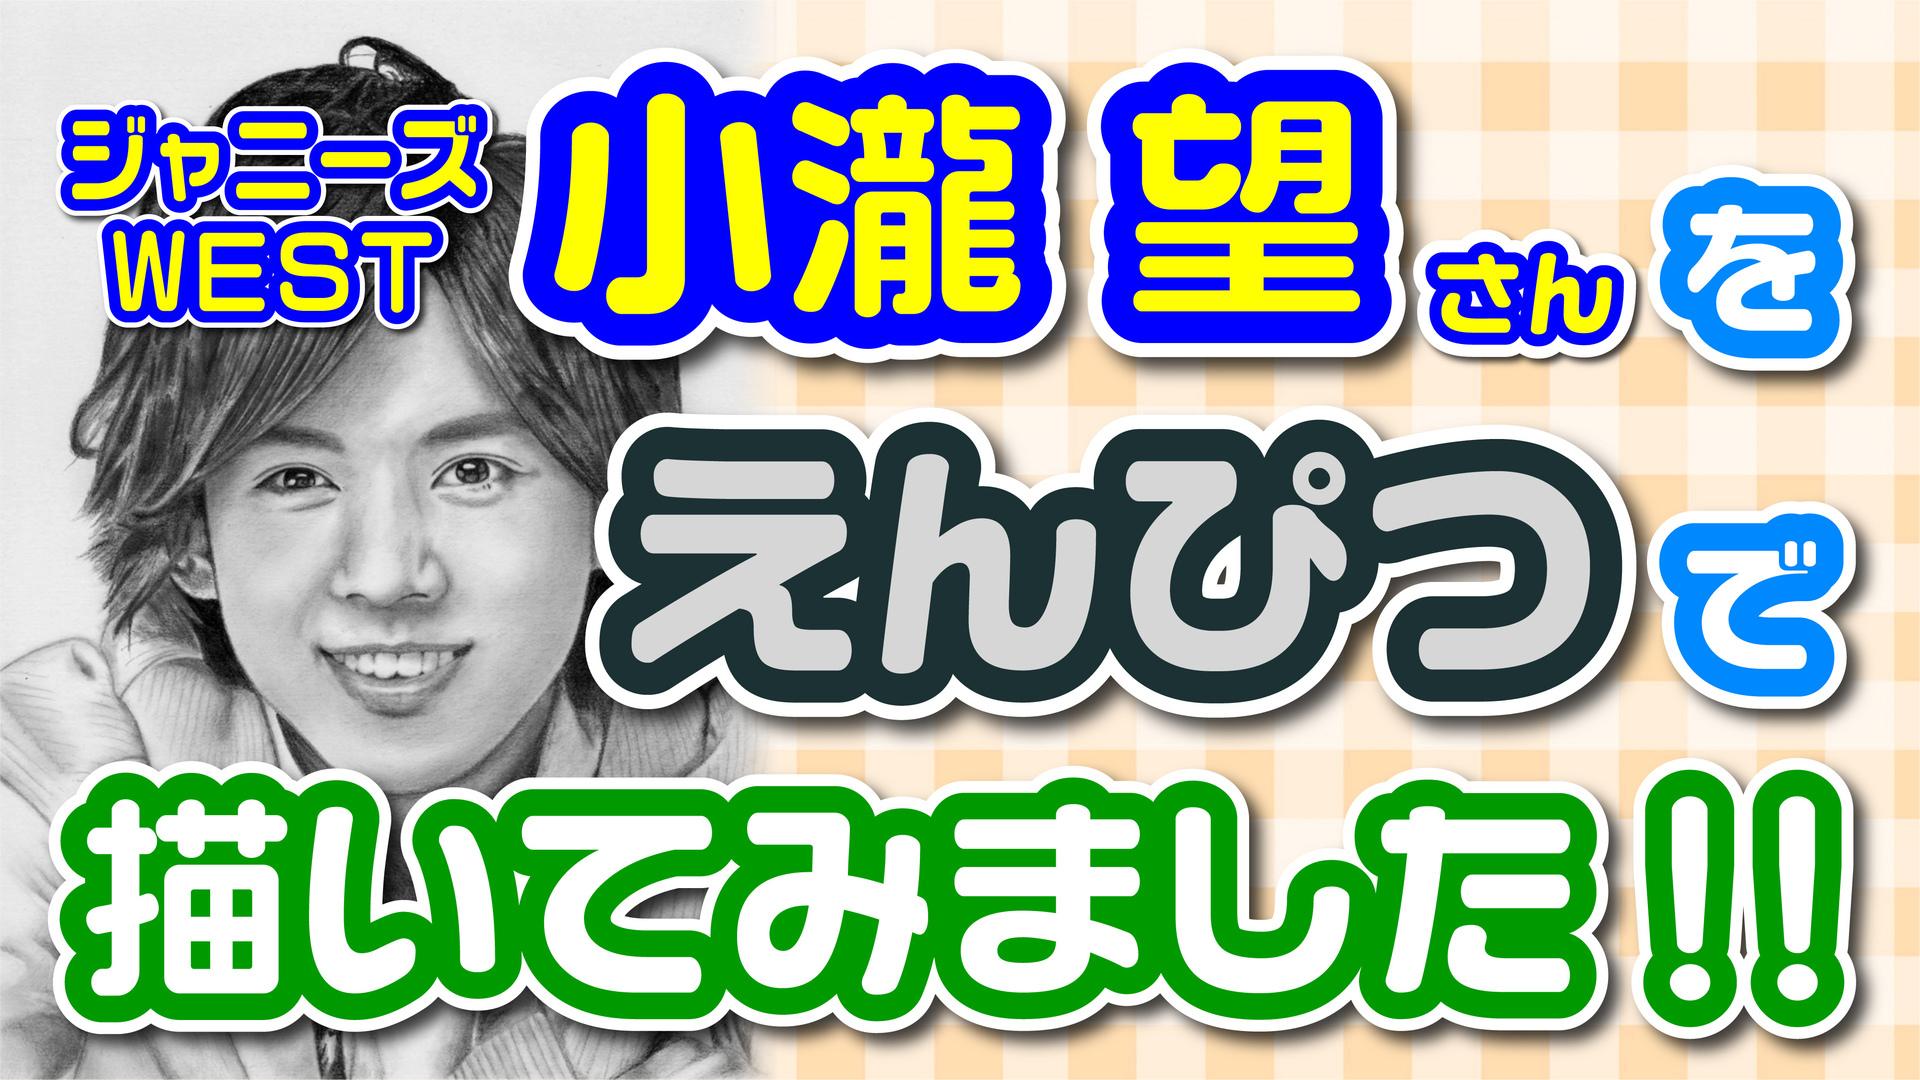 Youtubeサムネイル 小瀧望鉛筆画.jpg